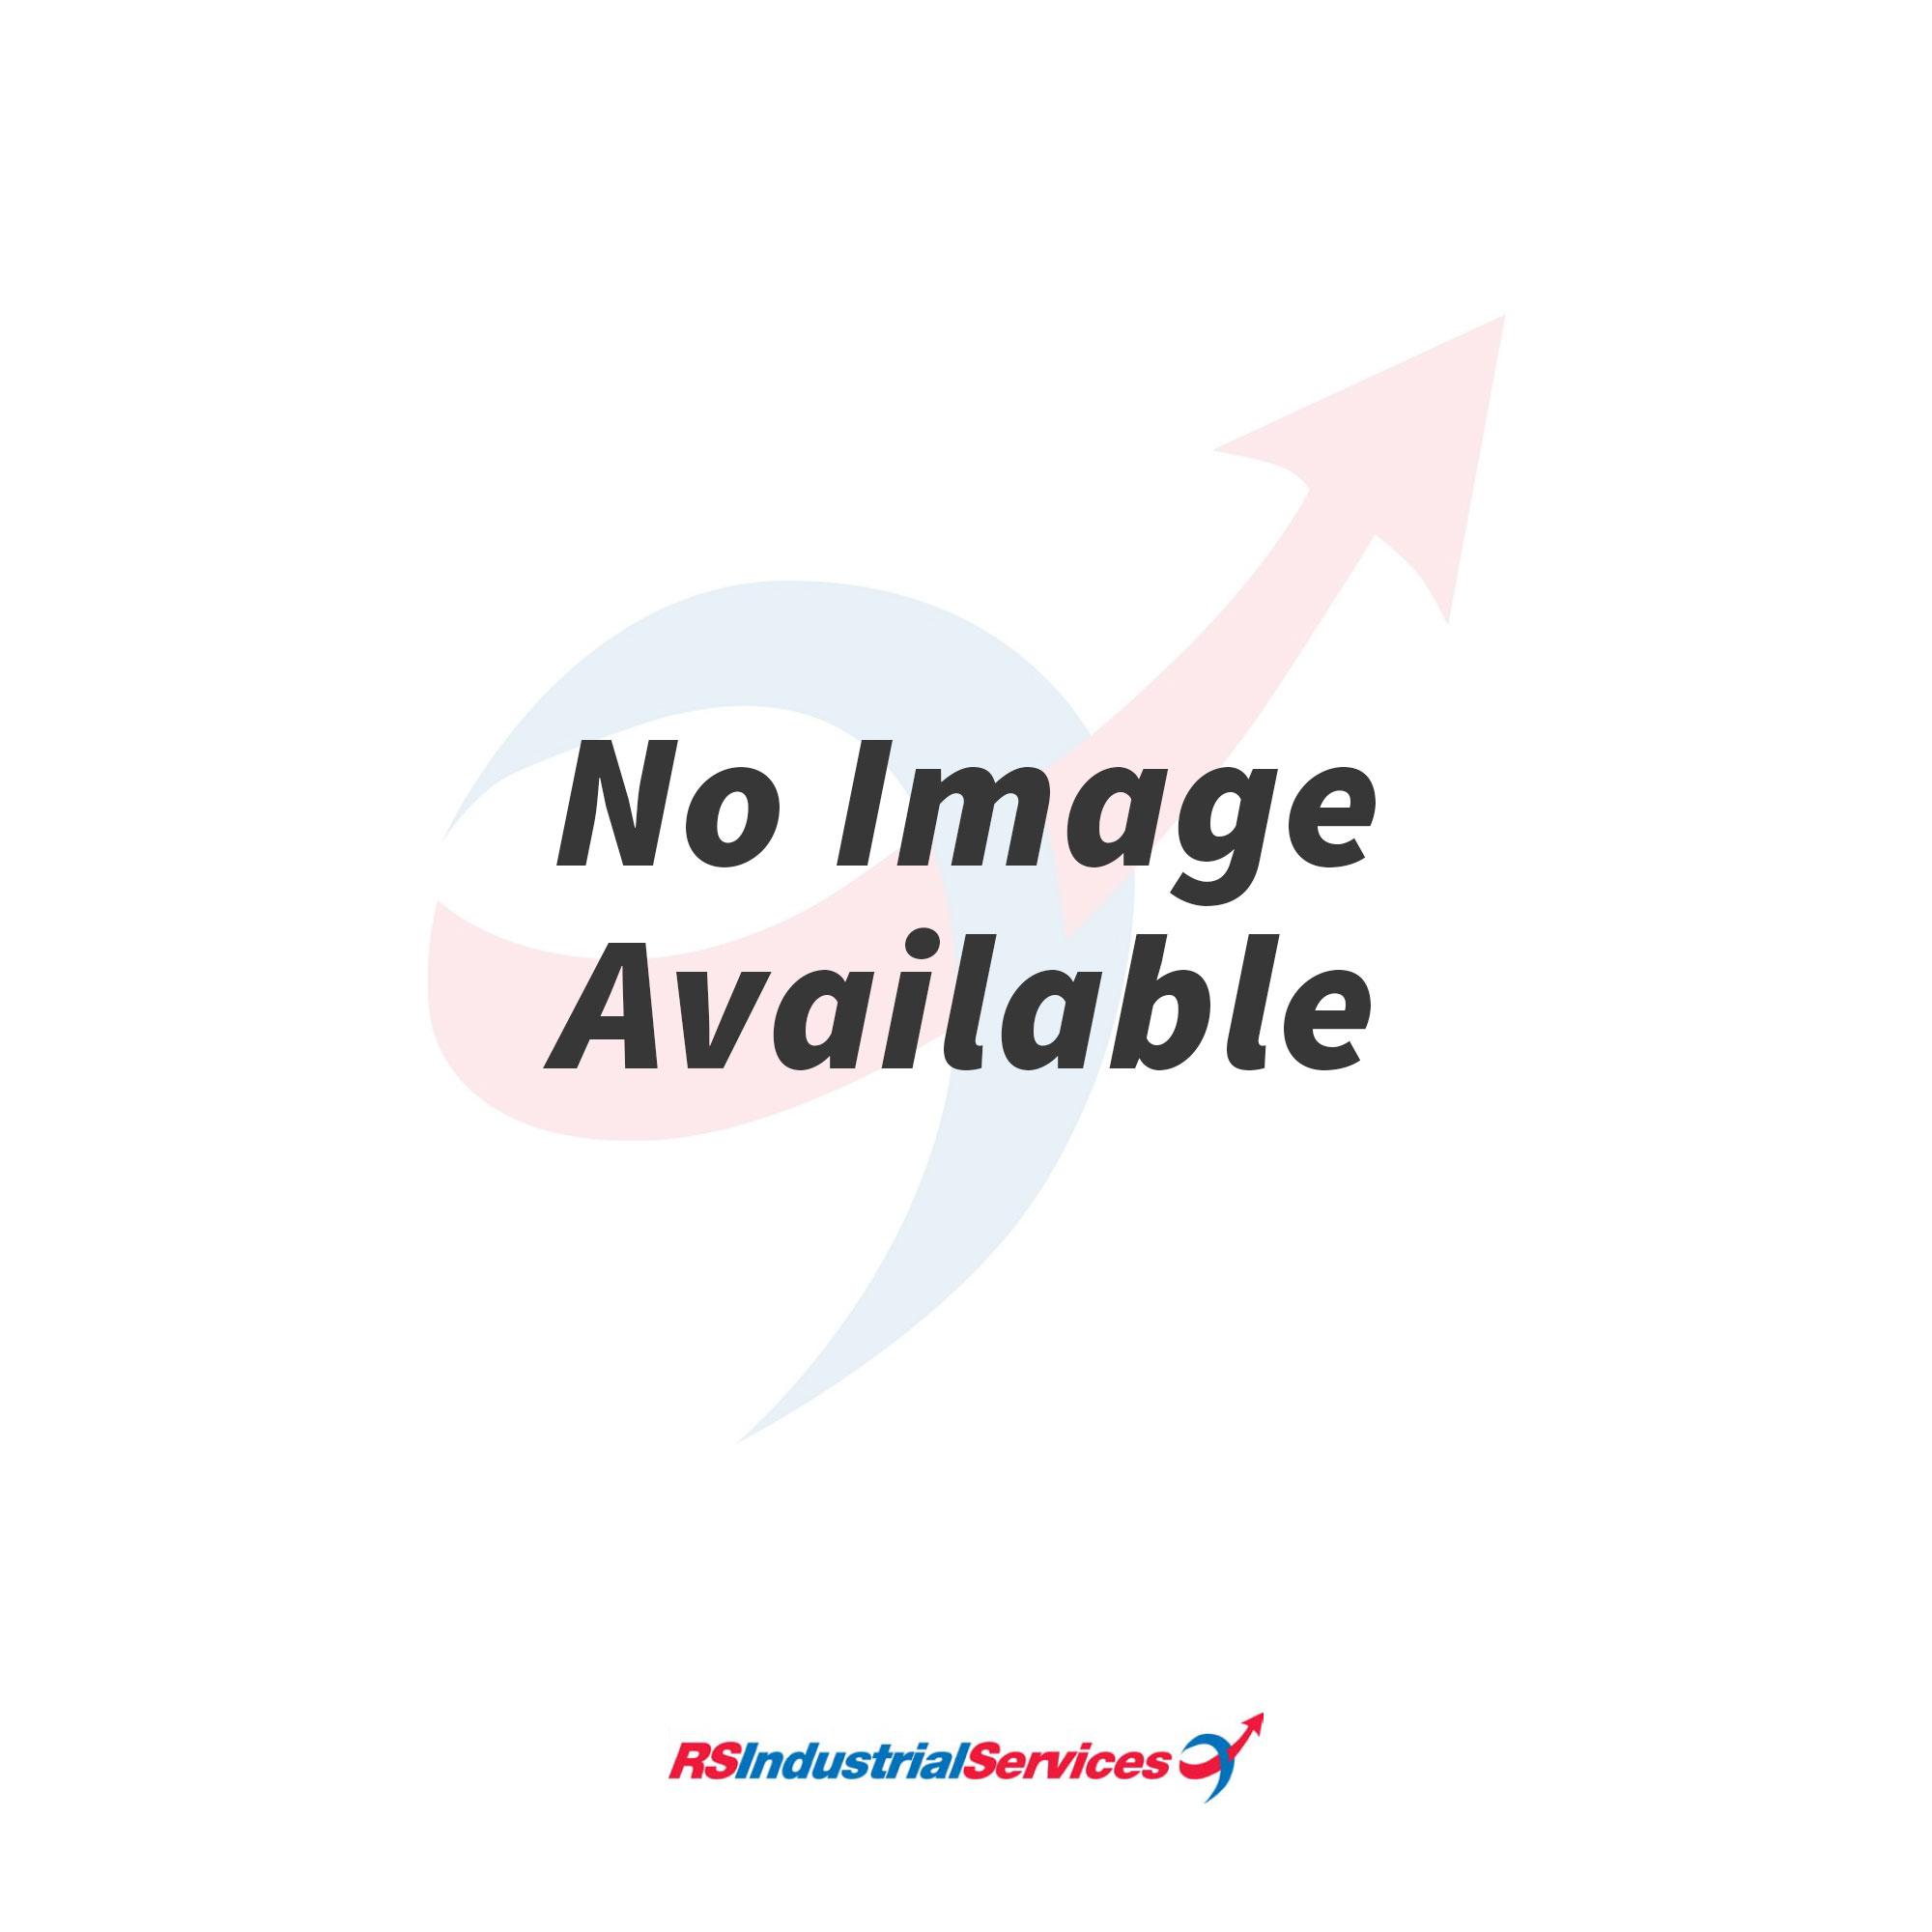 Ultraseal PTFE Gasket Sealing Tape 14mm(W) x 5m(L)